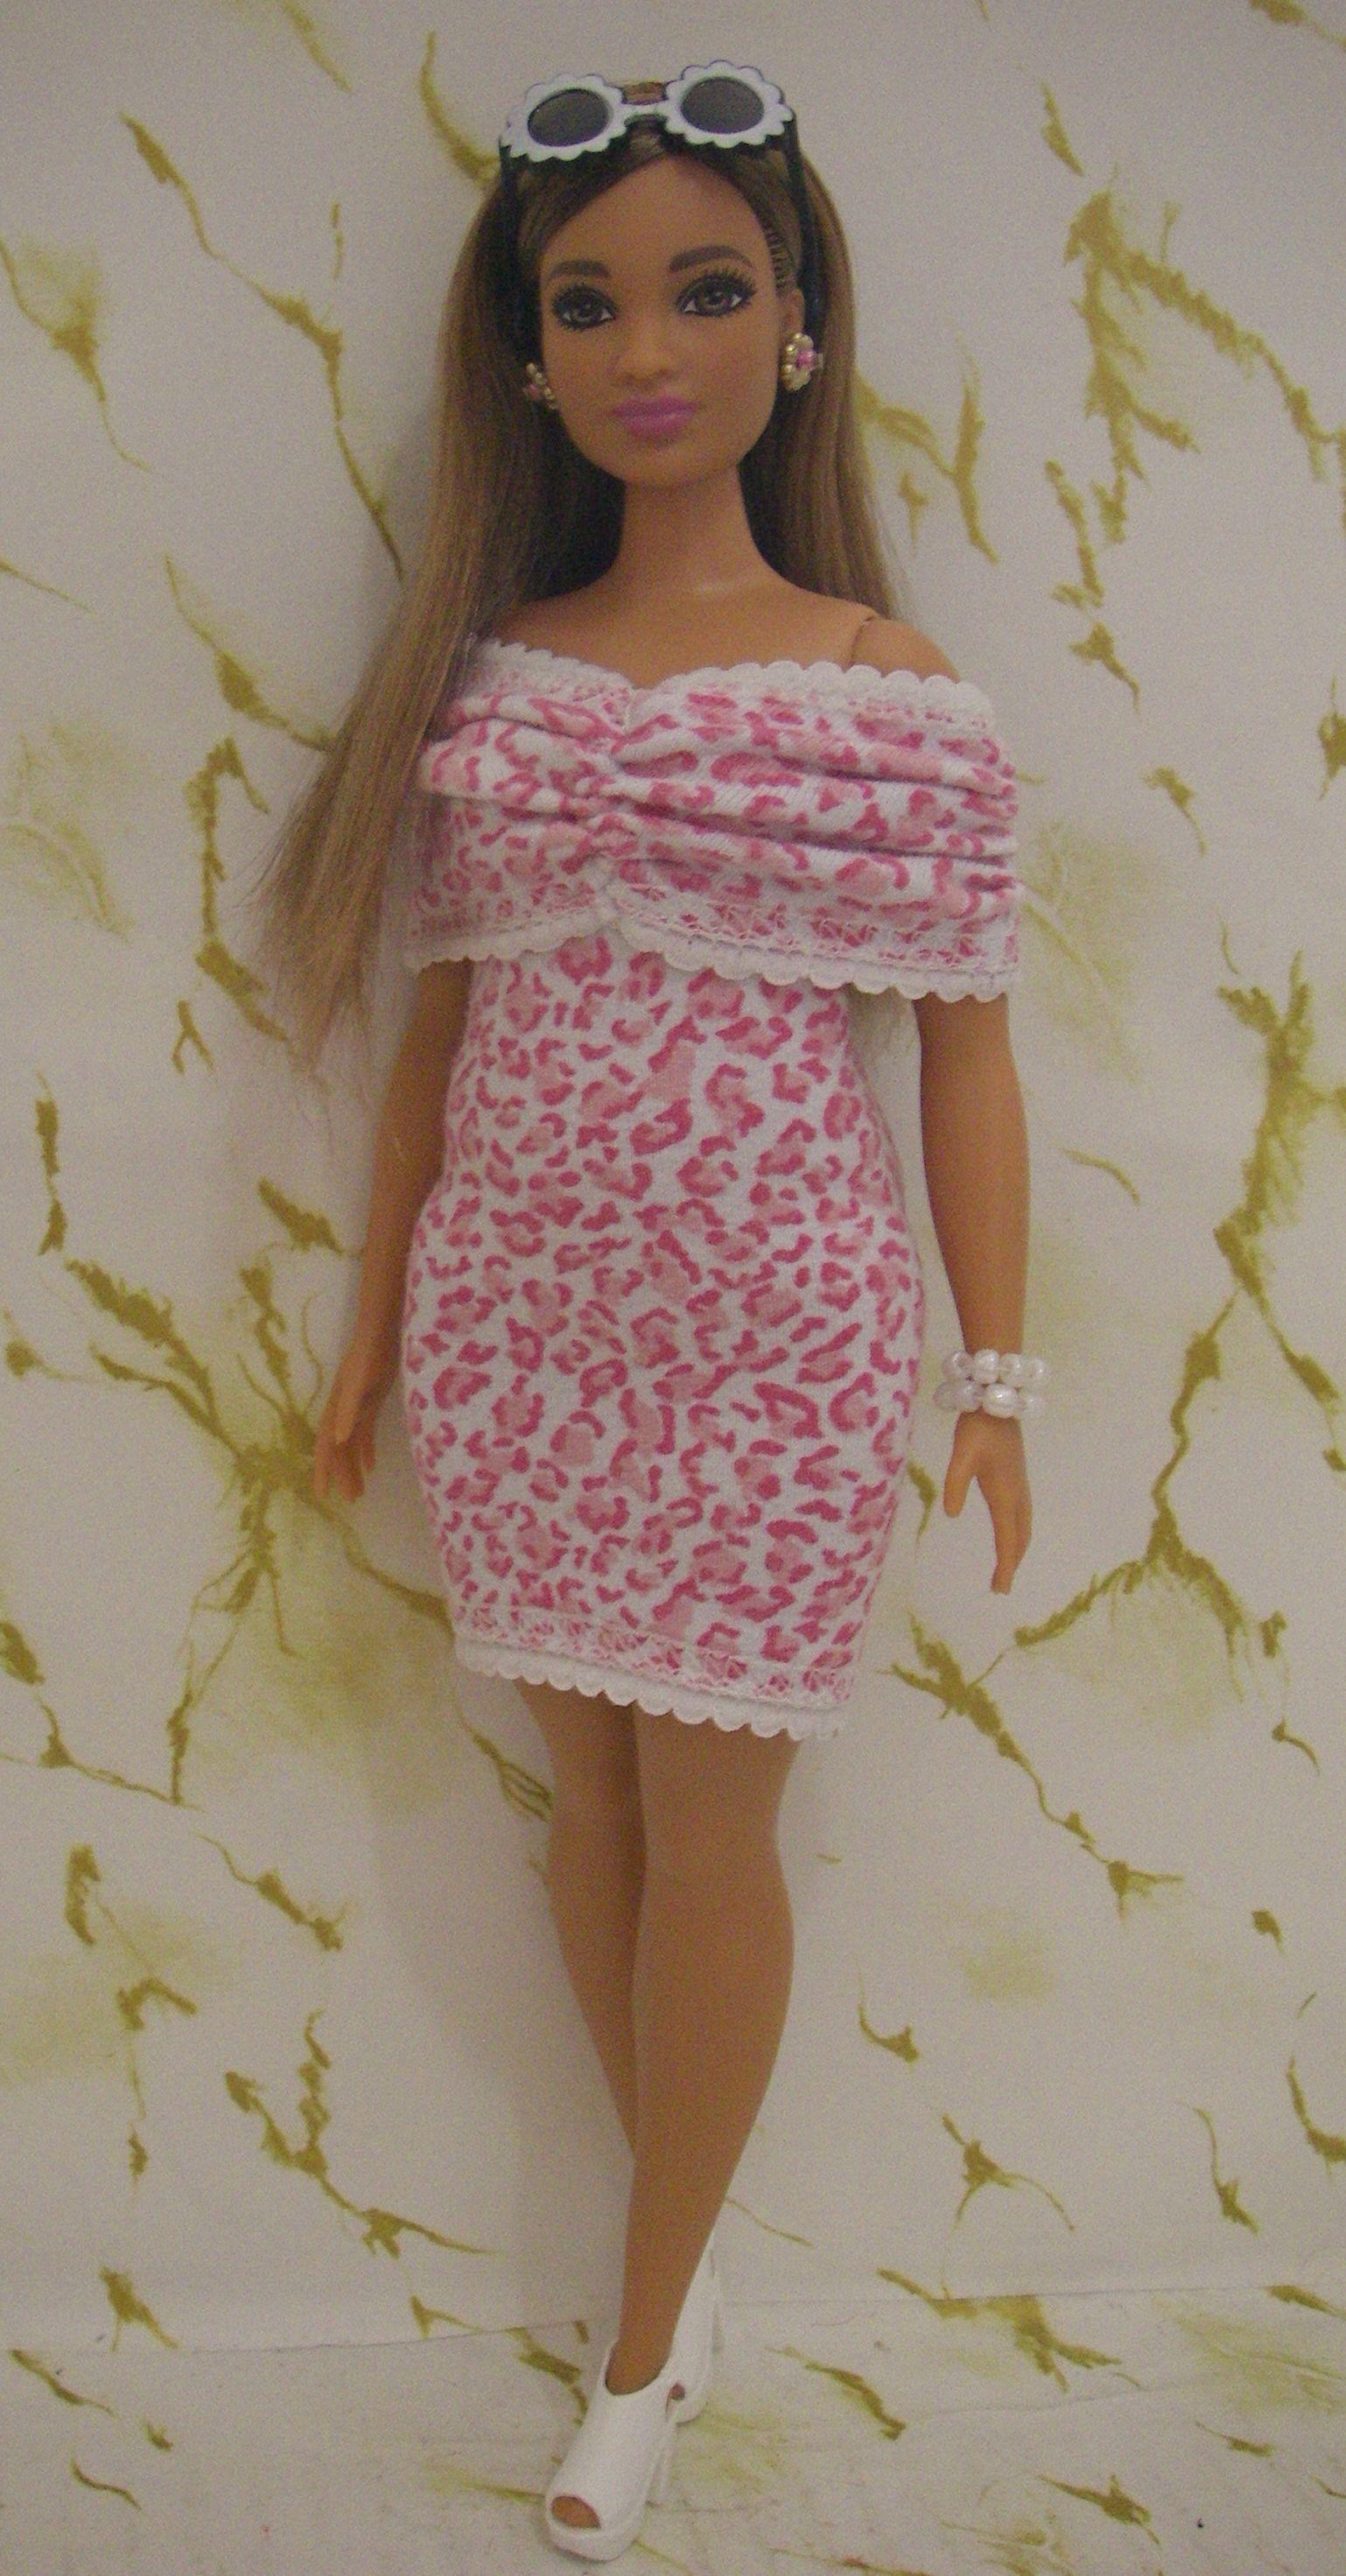 Mars matchmaker Stort universum  Barbie fashionista curvy | Barbie dress, Barbie fashionista ...